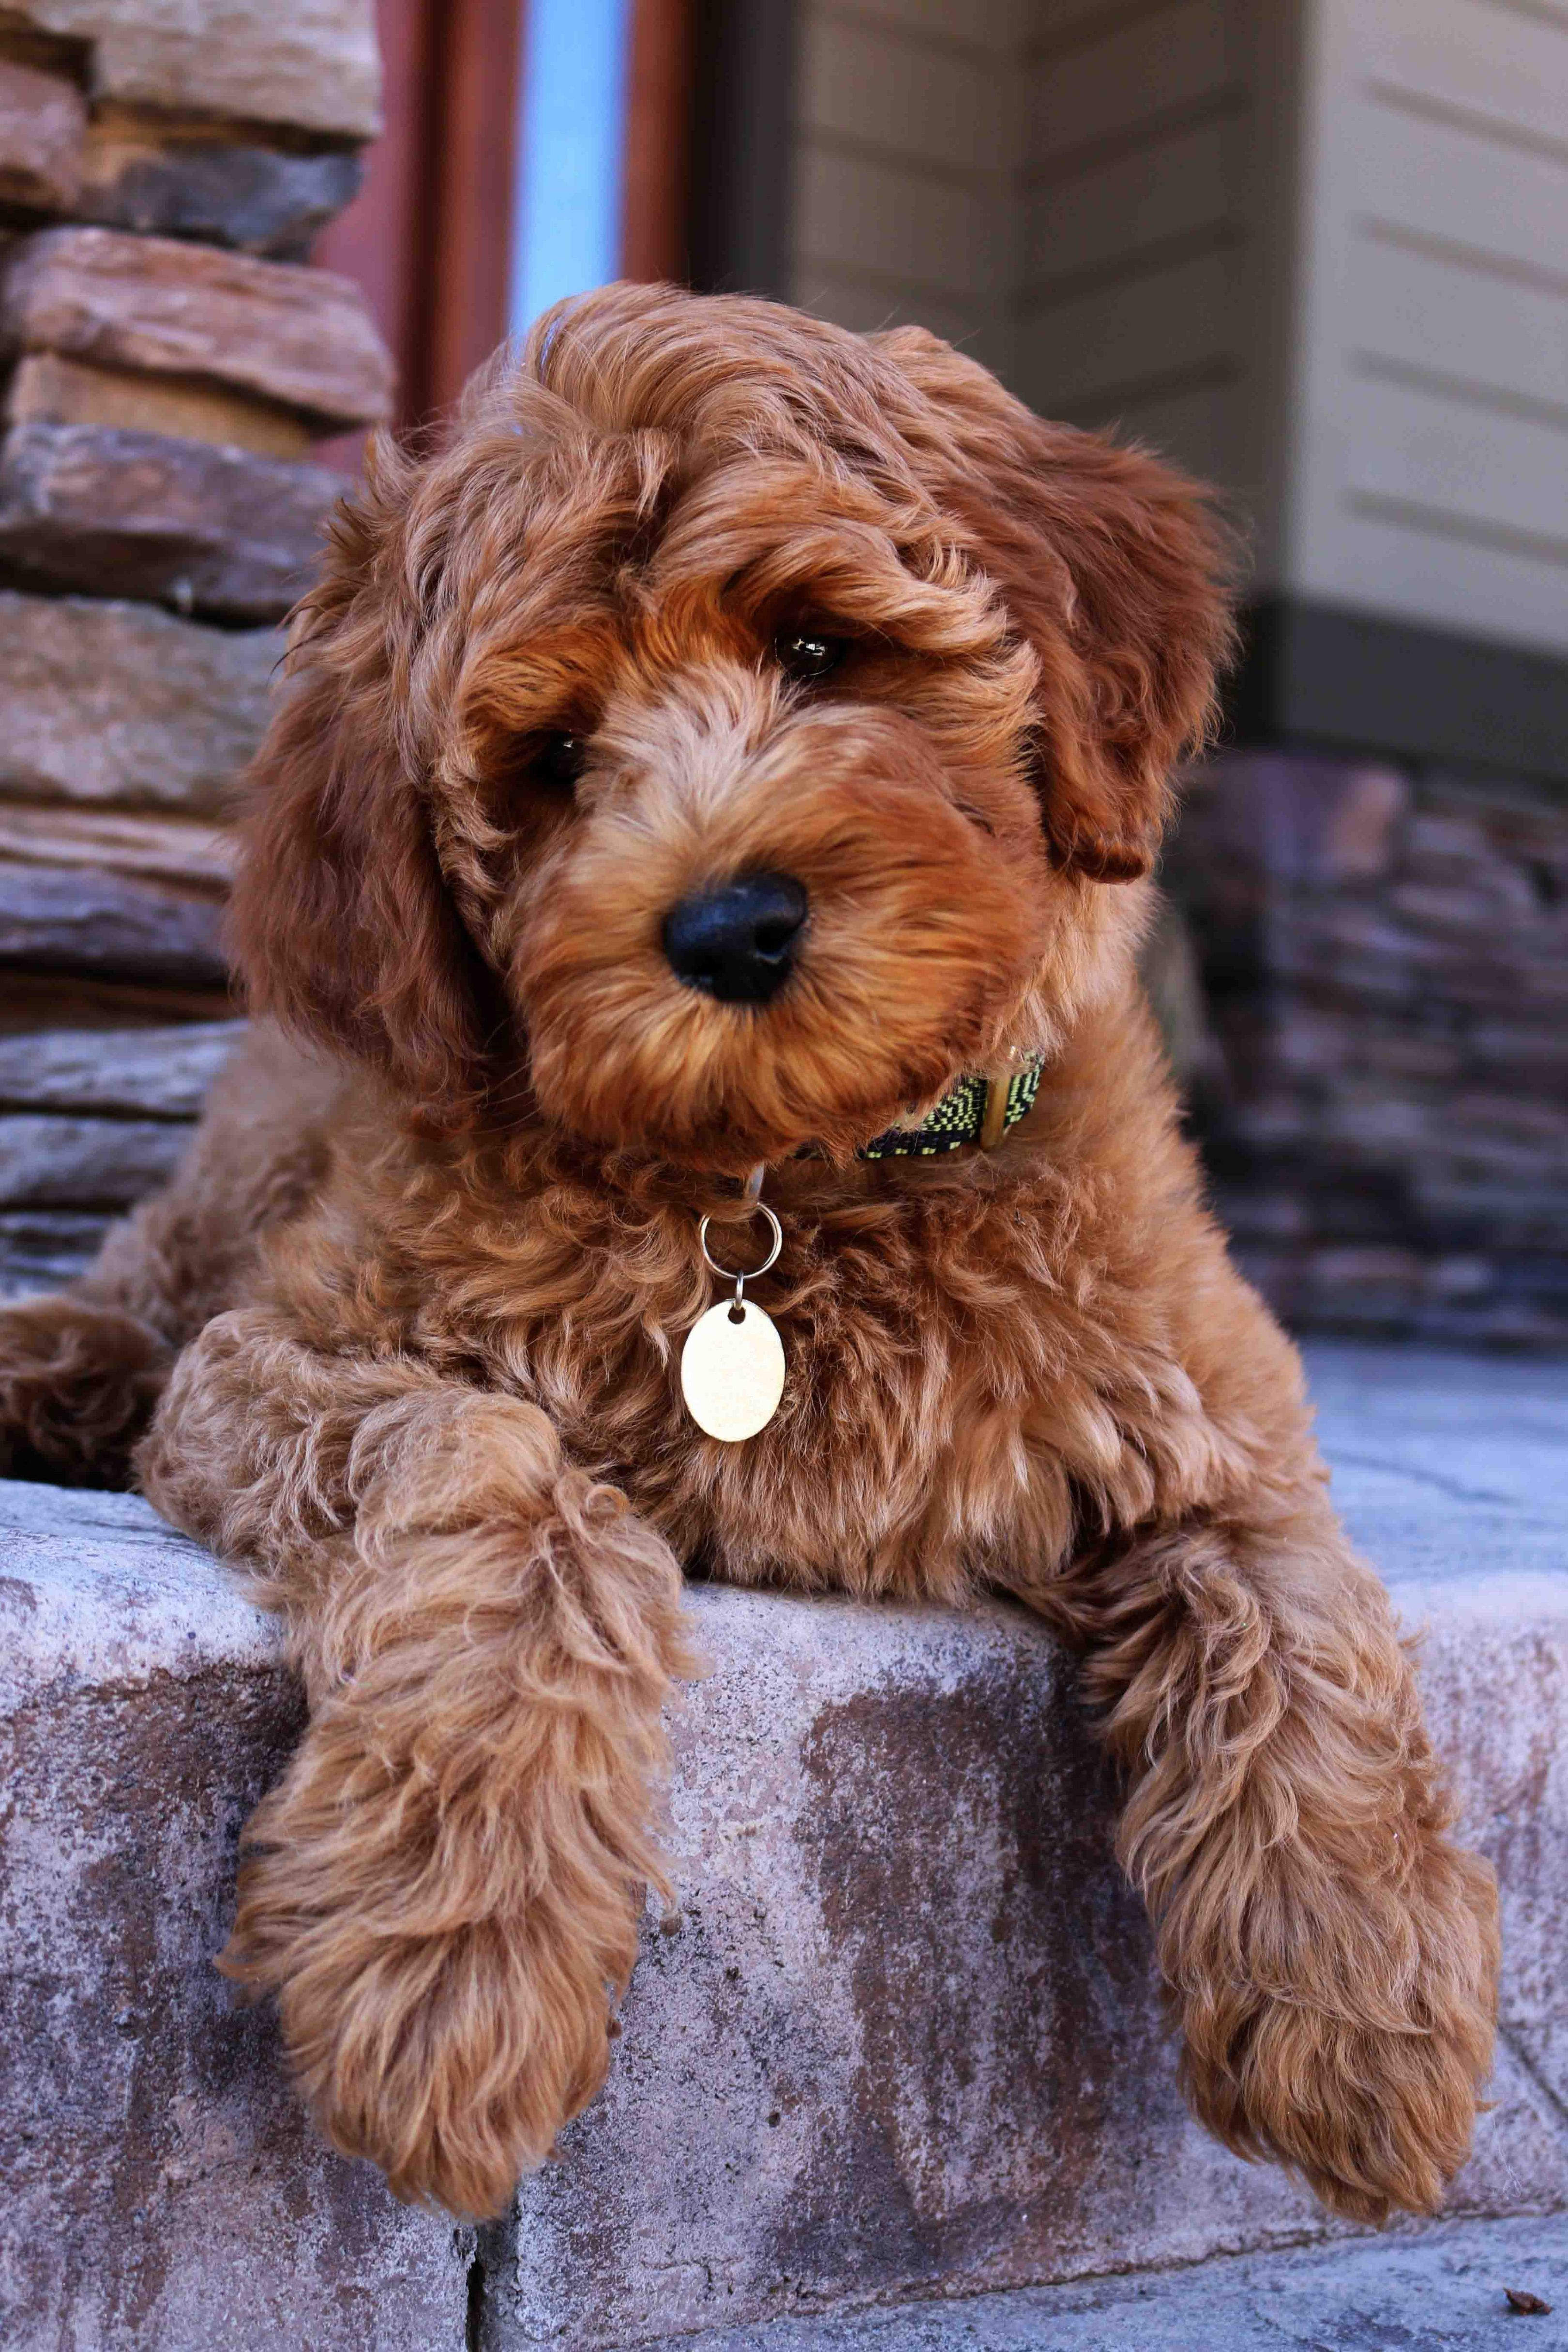 Labradoodle Puppy Adoption Puppy adoption, Mini